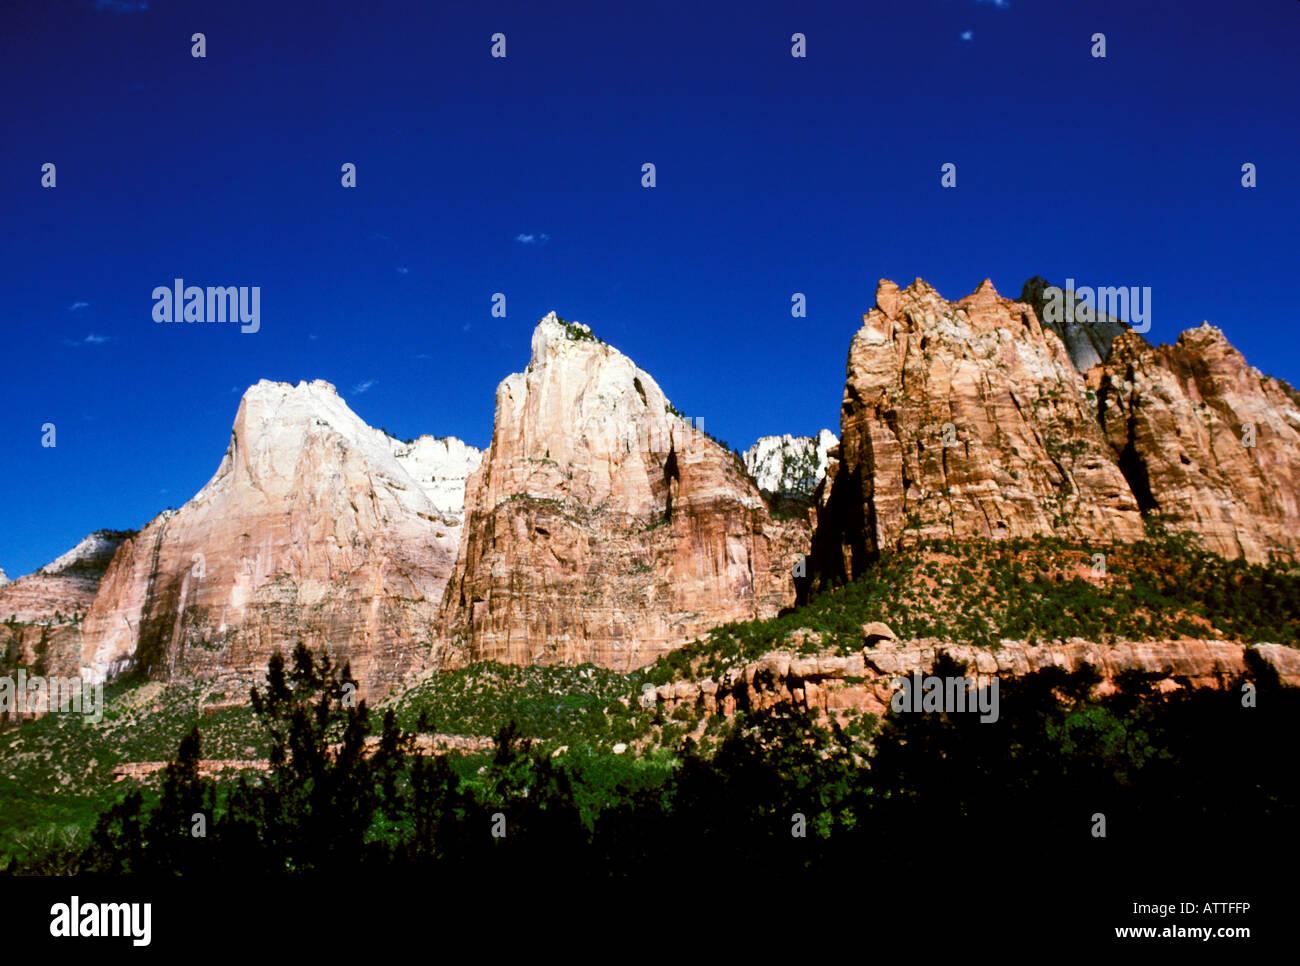 UT Utah Zion National Park geologic rock formations geology - Stock Image